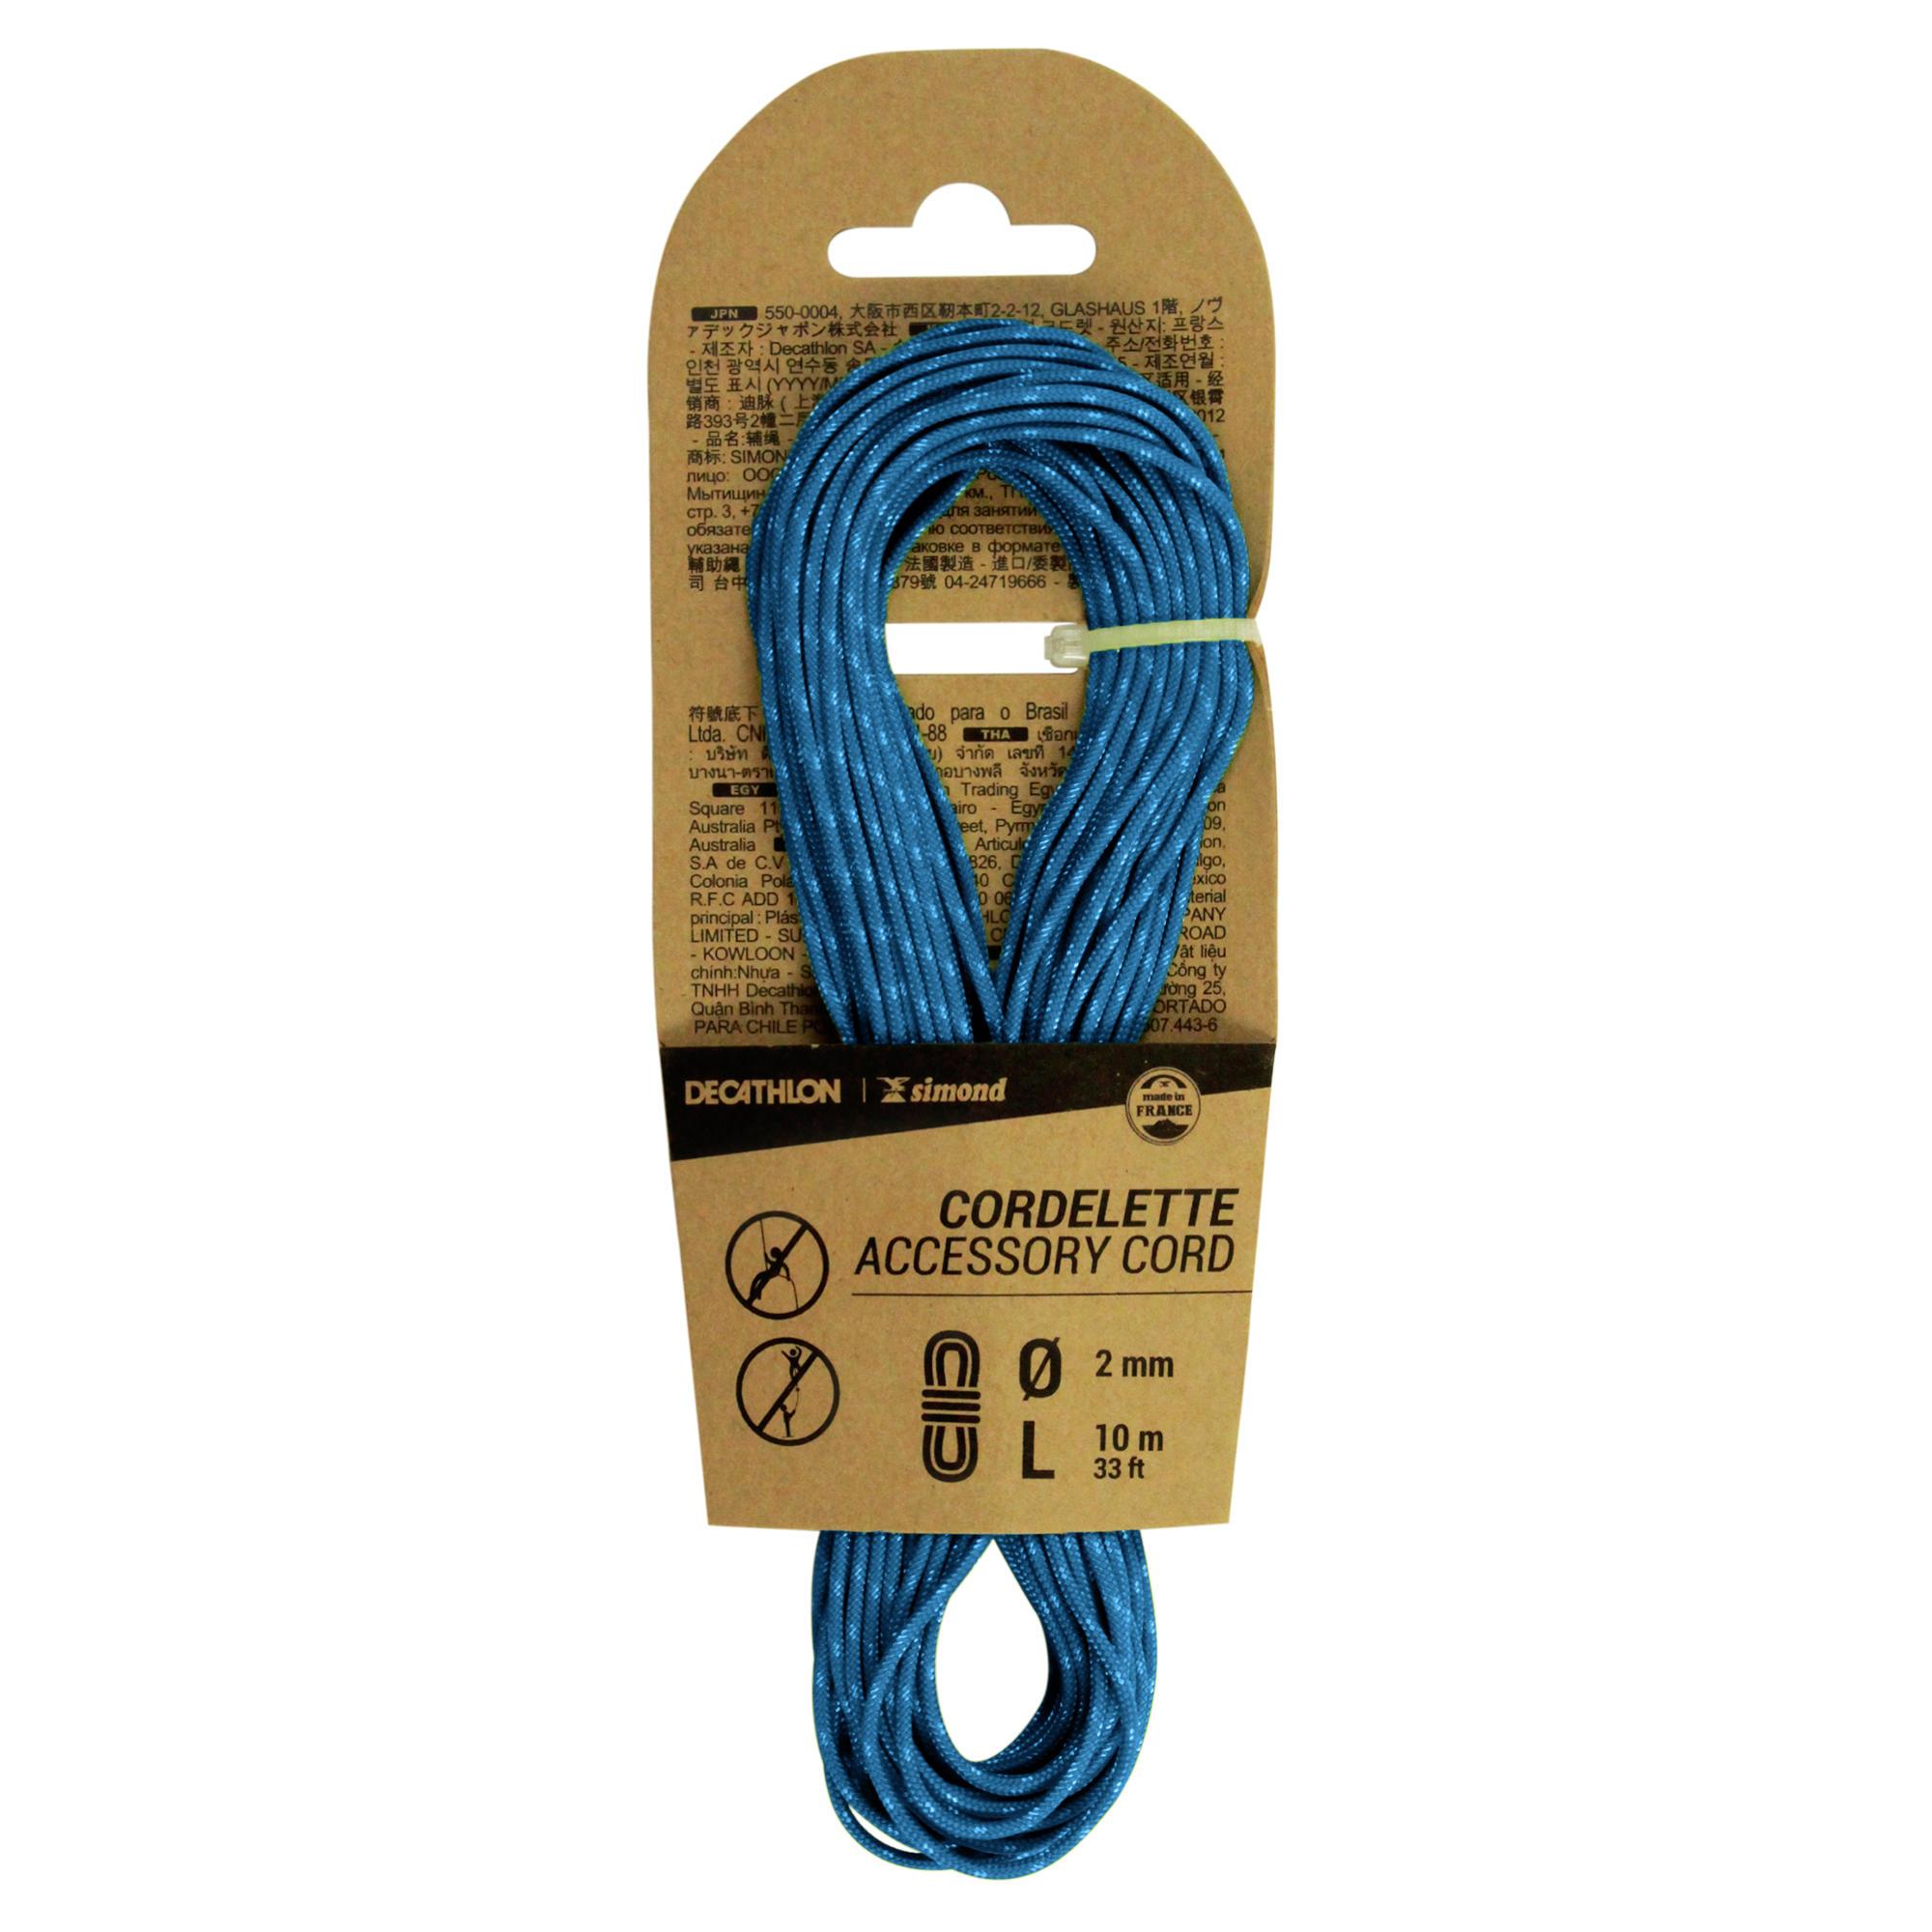 2 mm x 10 m cord